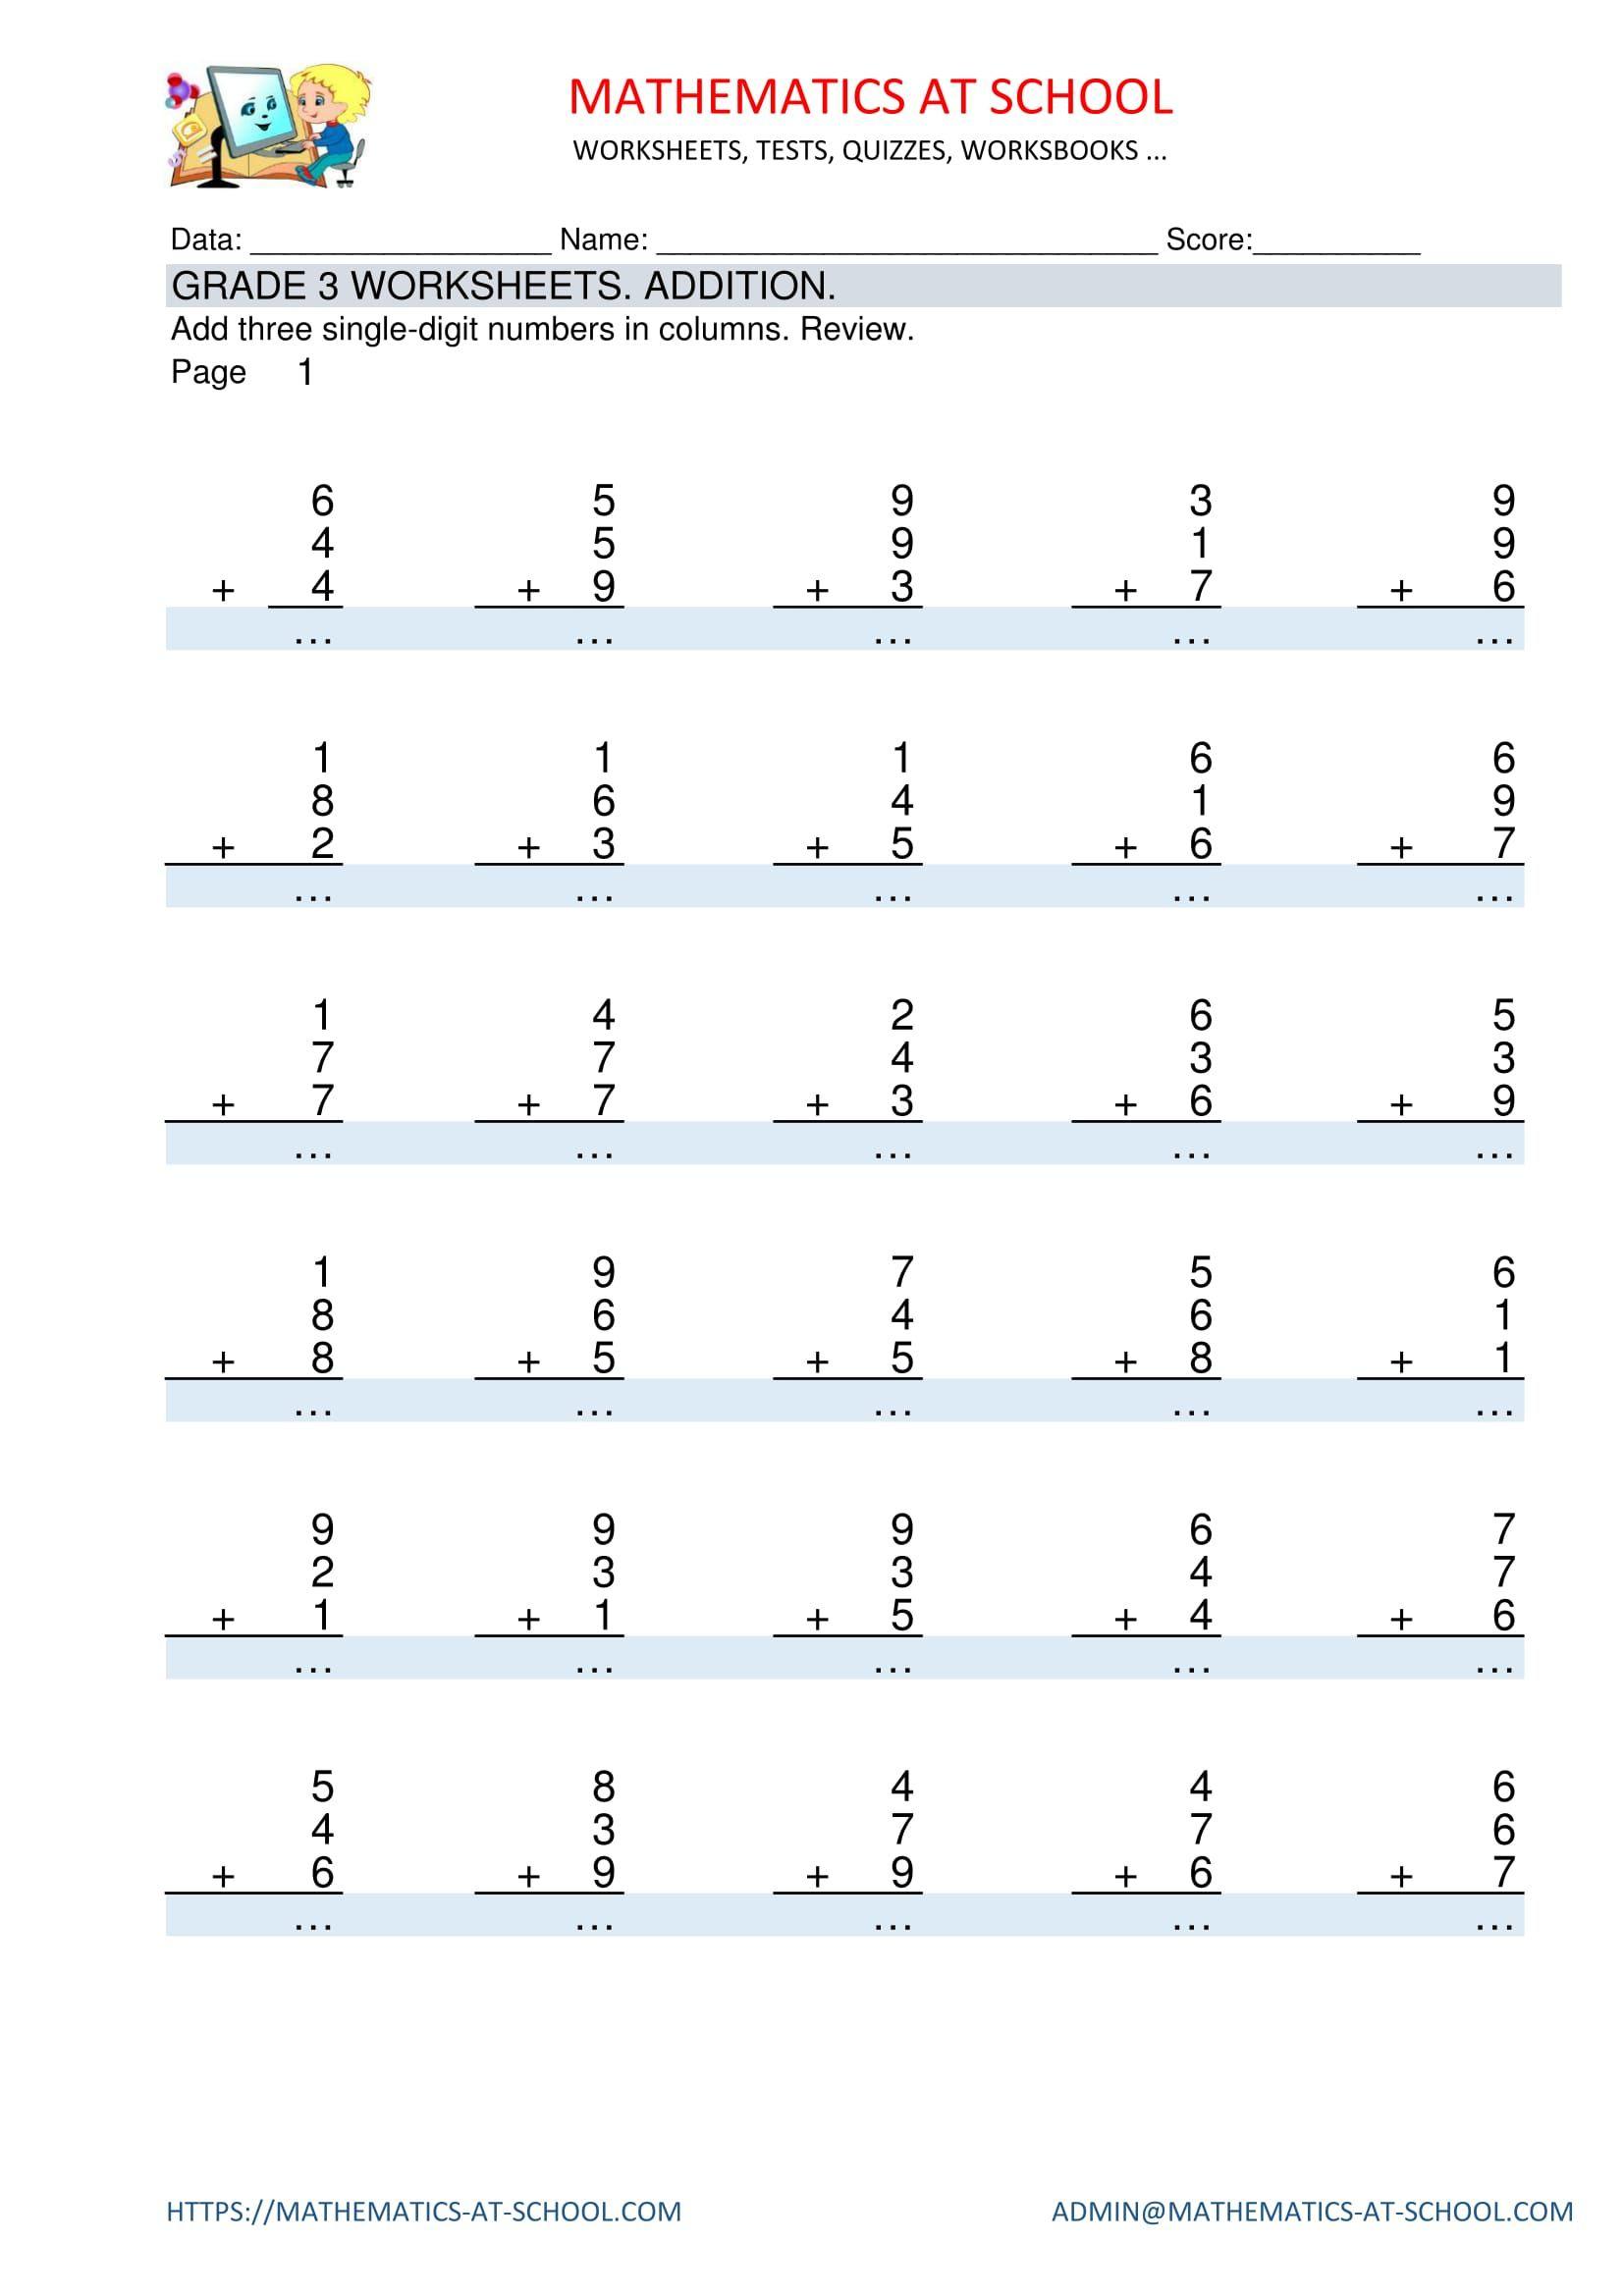 Pinmathematics School On Grade 3 Maths Worksheets And Free | Grade 3 Maths Worksheets Printable